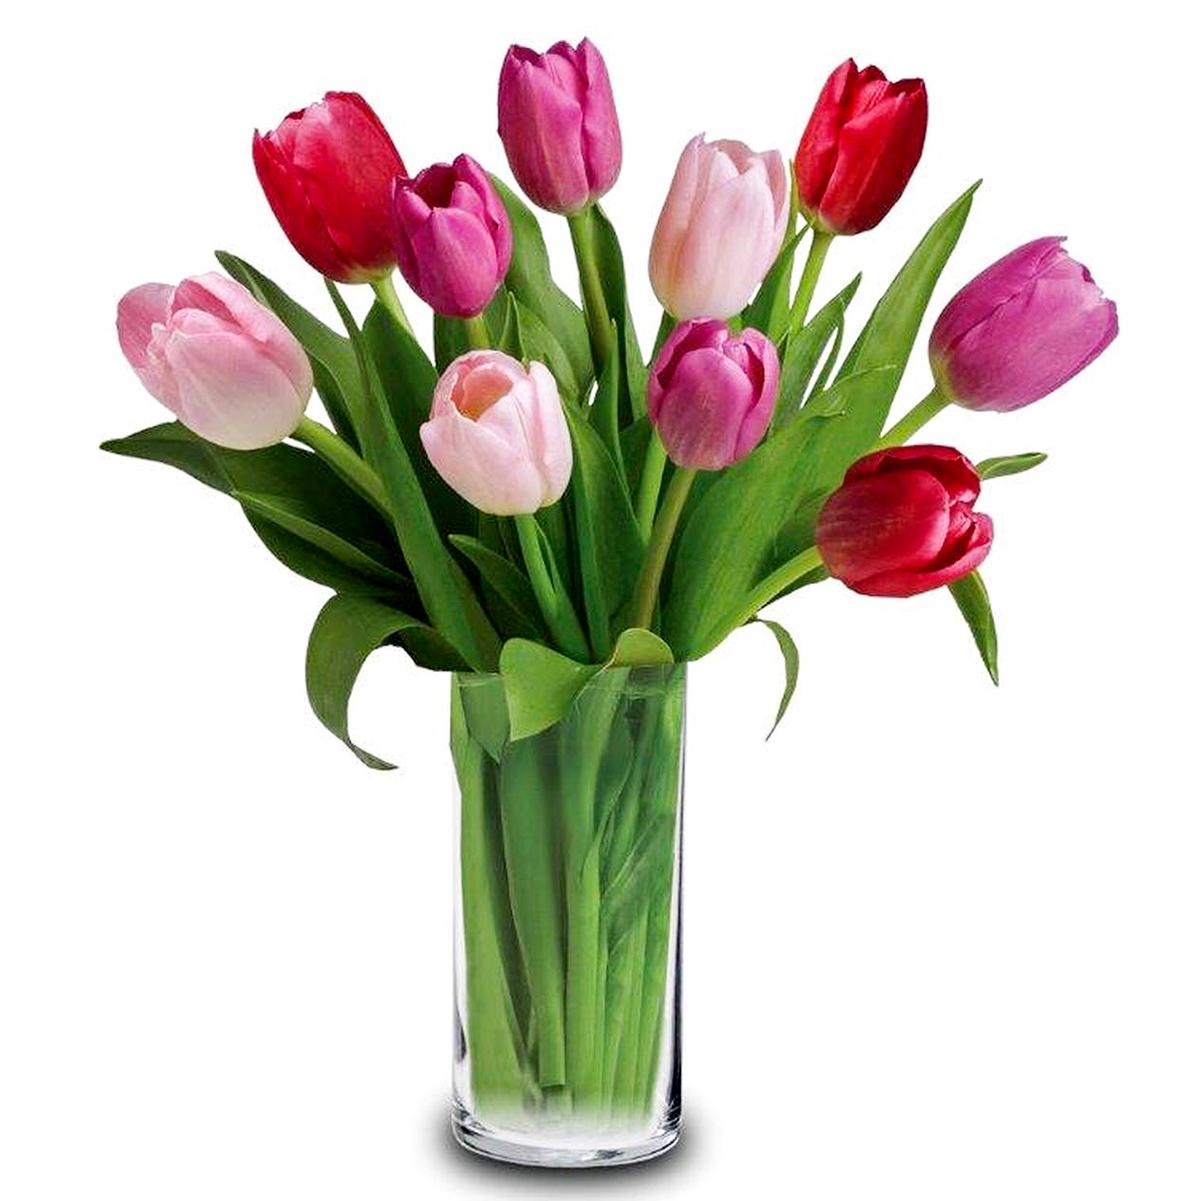 Carlton's flowers - tulips in a vase